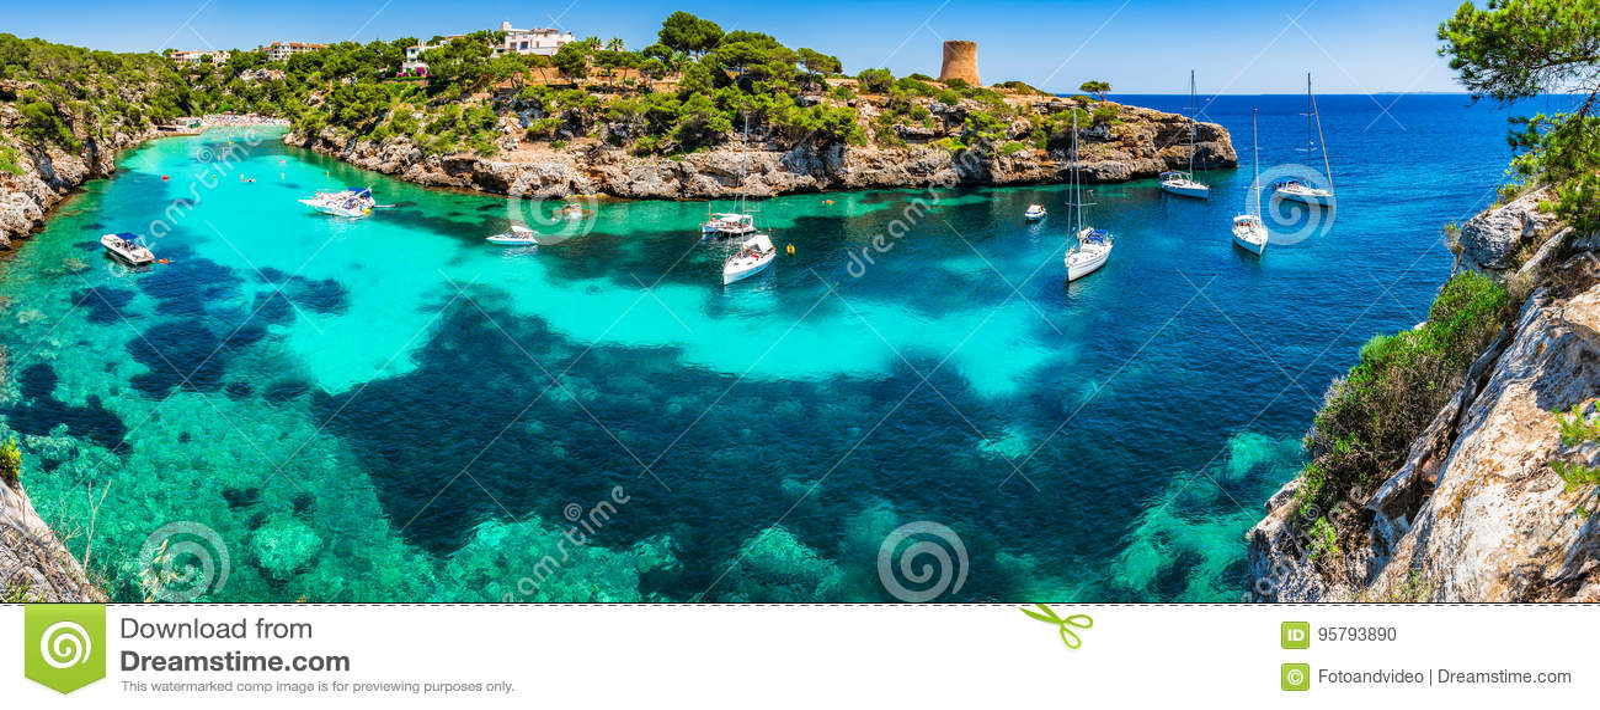 Mediterranean Sea Spain Majorca Cala Pi